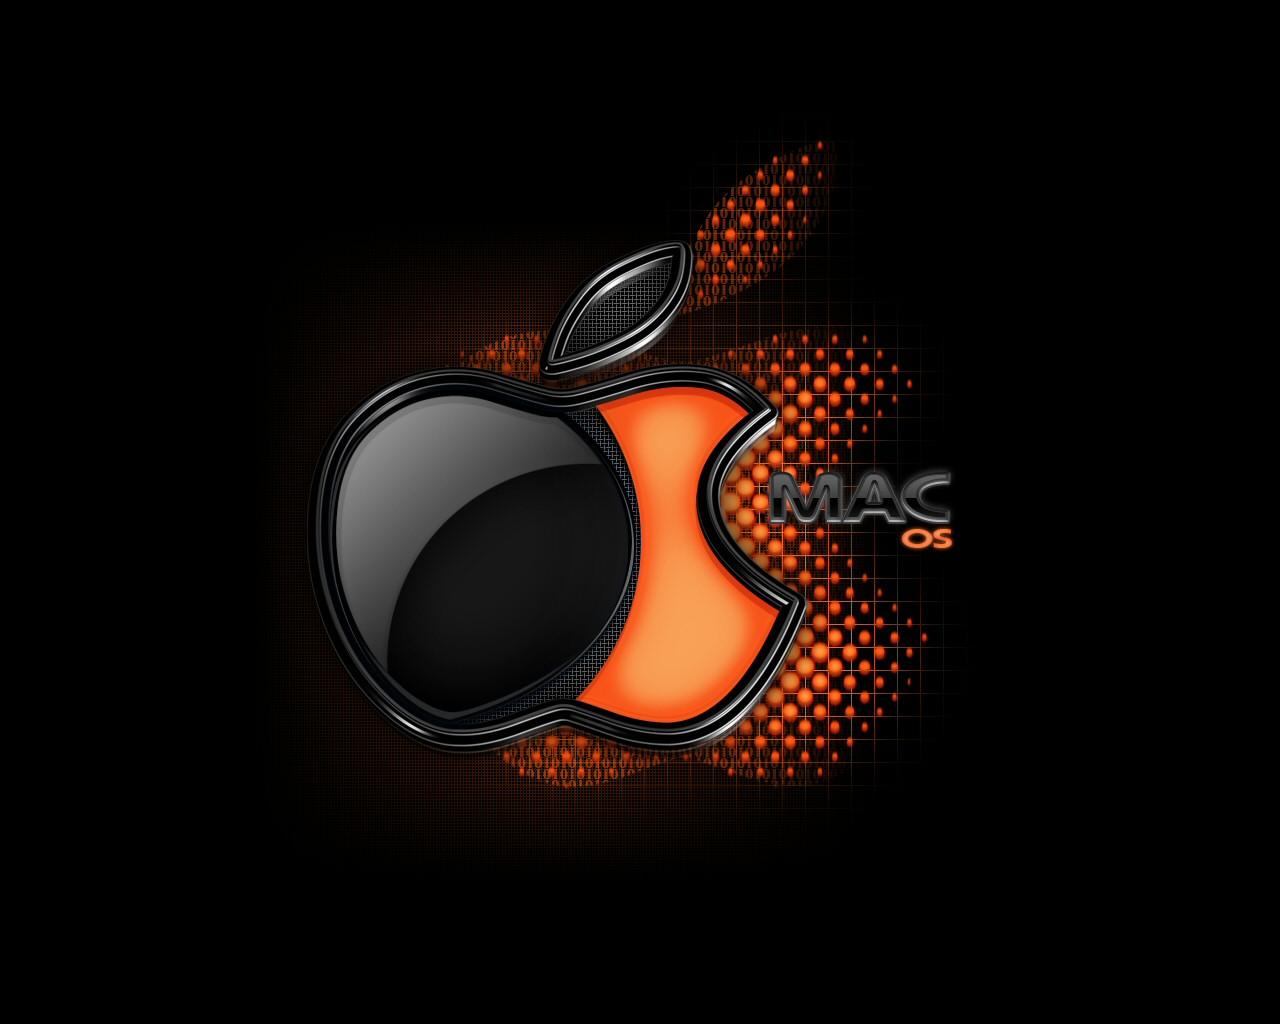 apple mac wallpaper hd apple mac wallpaper hd apple mac wallpaper hd 1280x1024